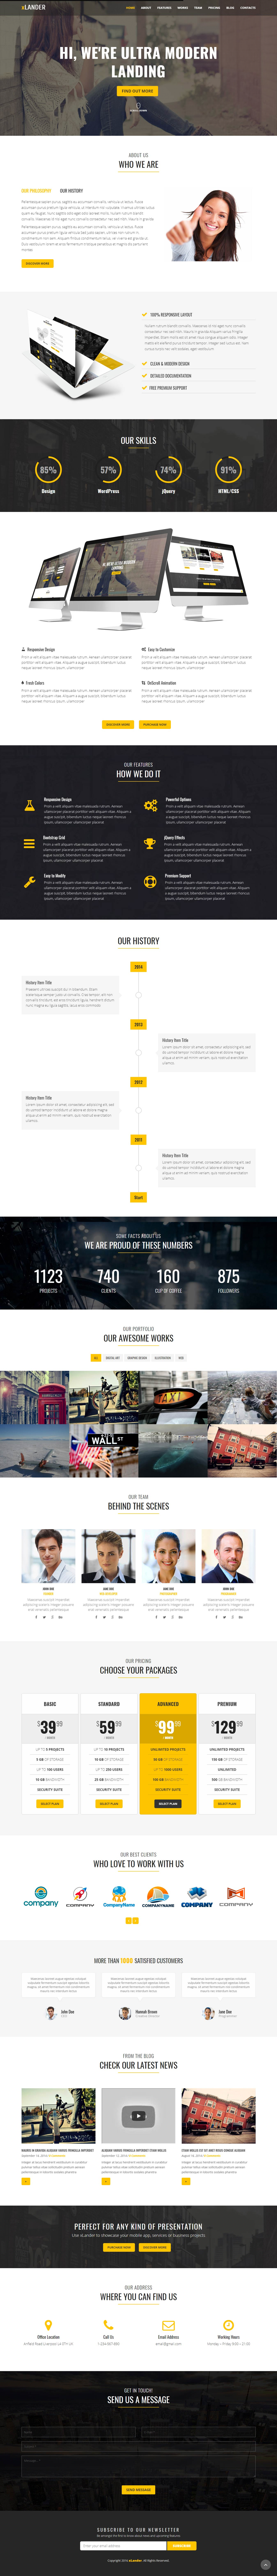 xlander premium wordpress landing page theme - 10+ Best Premium Landing Page WordPress Themes